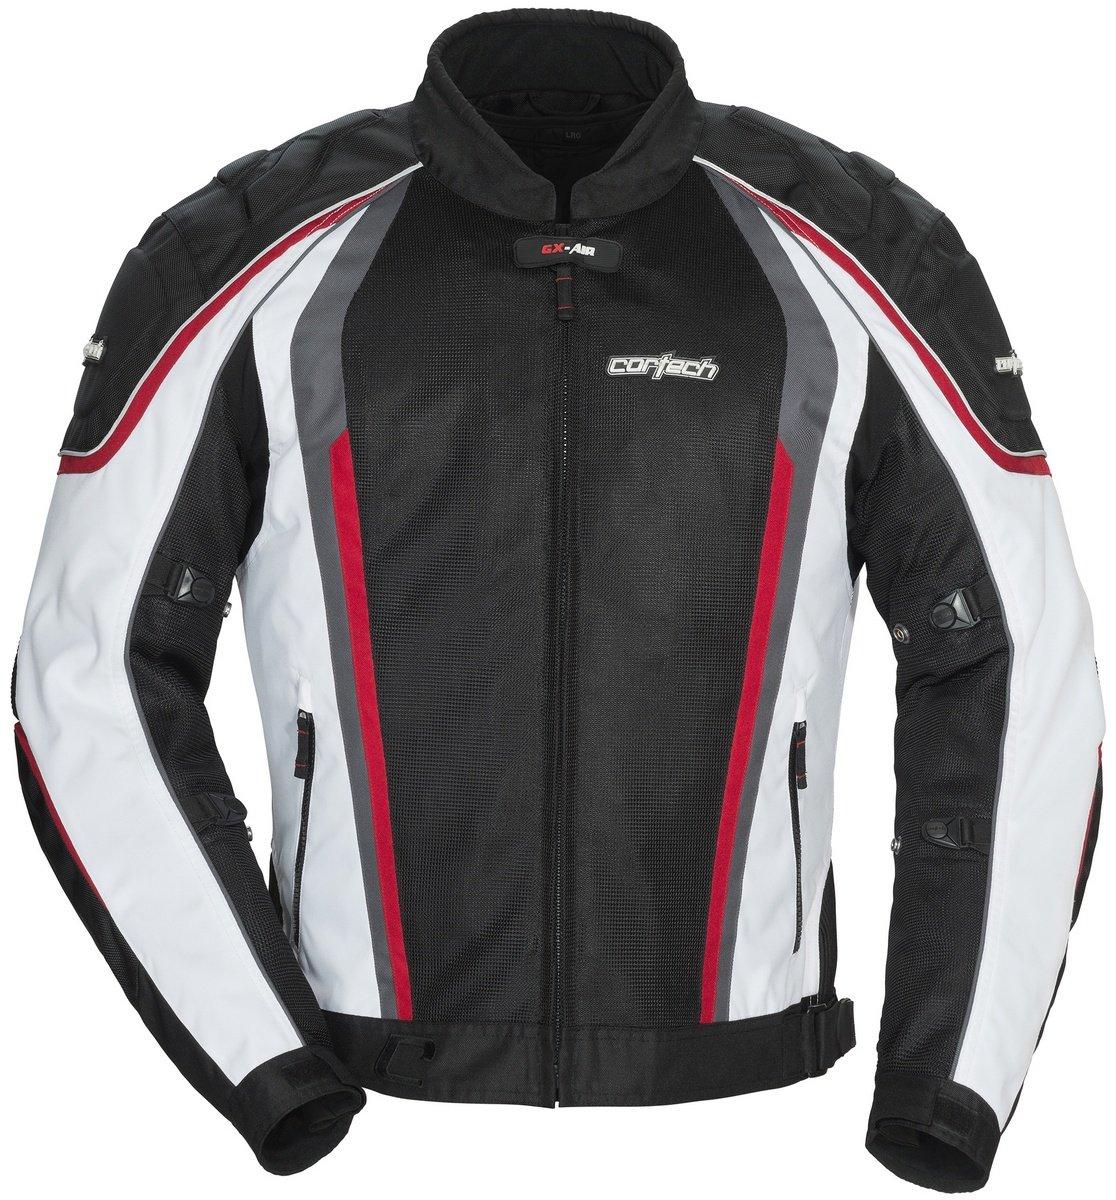 Cortech GX Sport Air 4 Jacket White/Black XXL 8985-0409-08